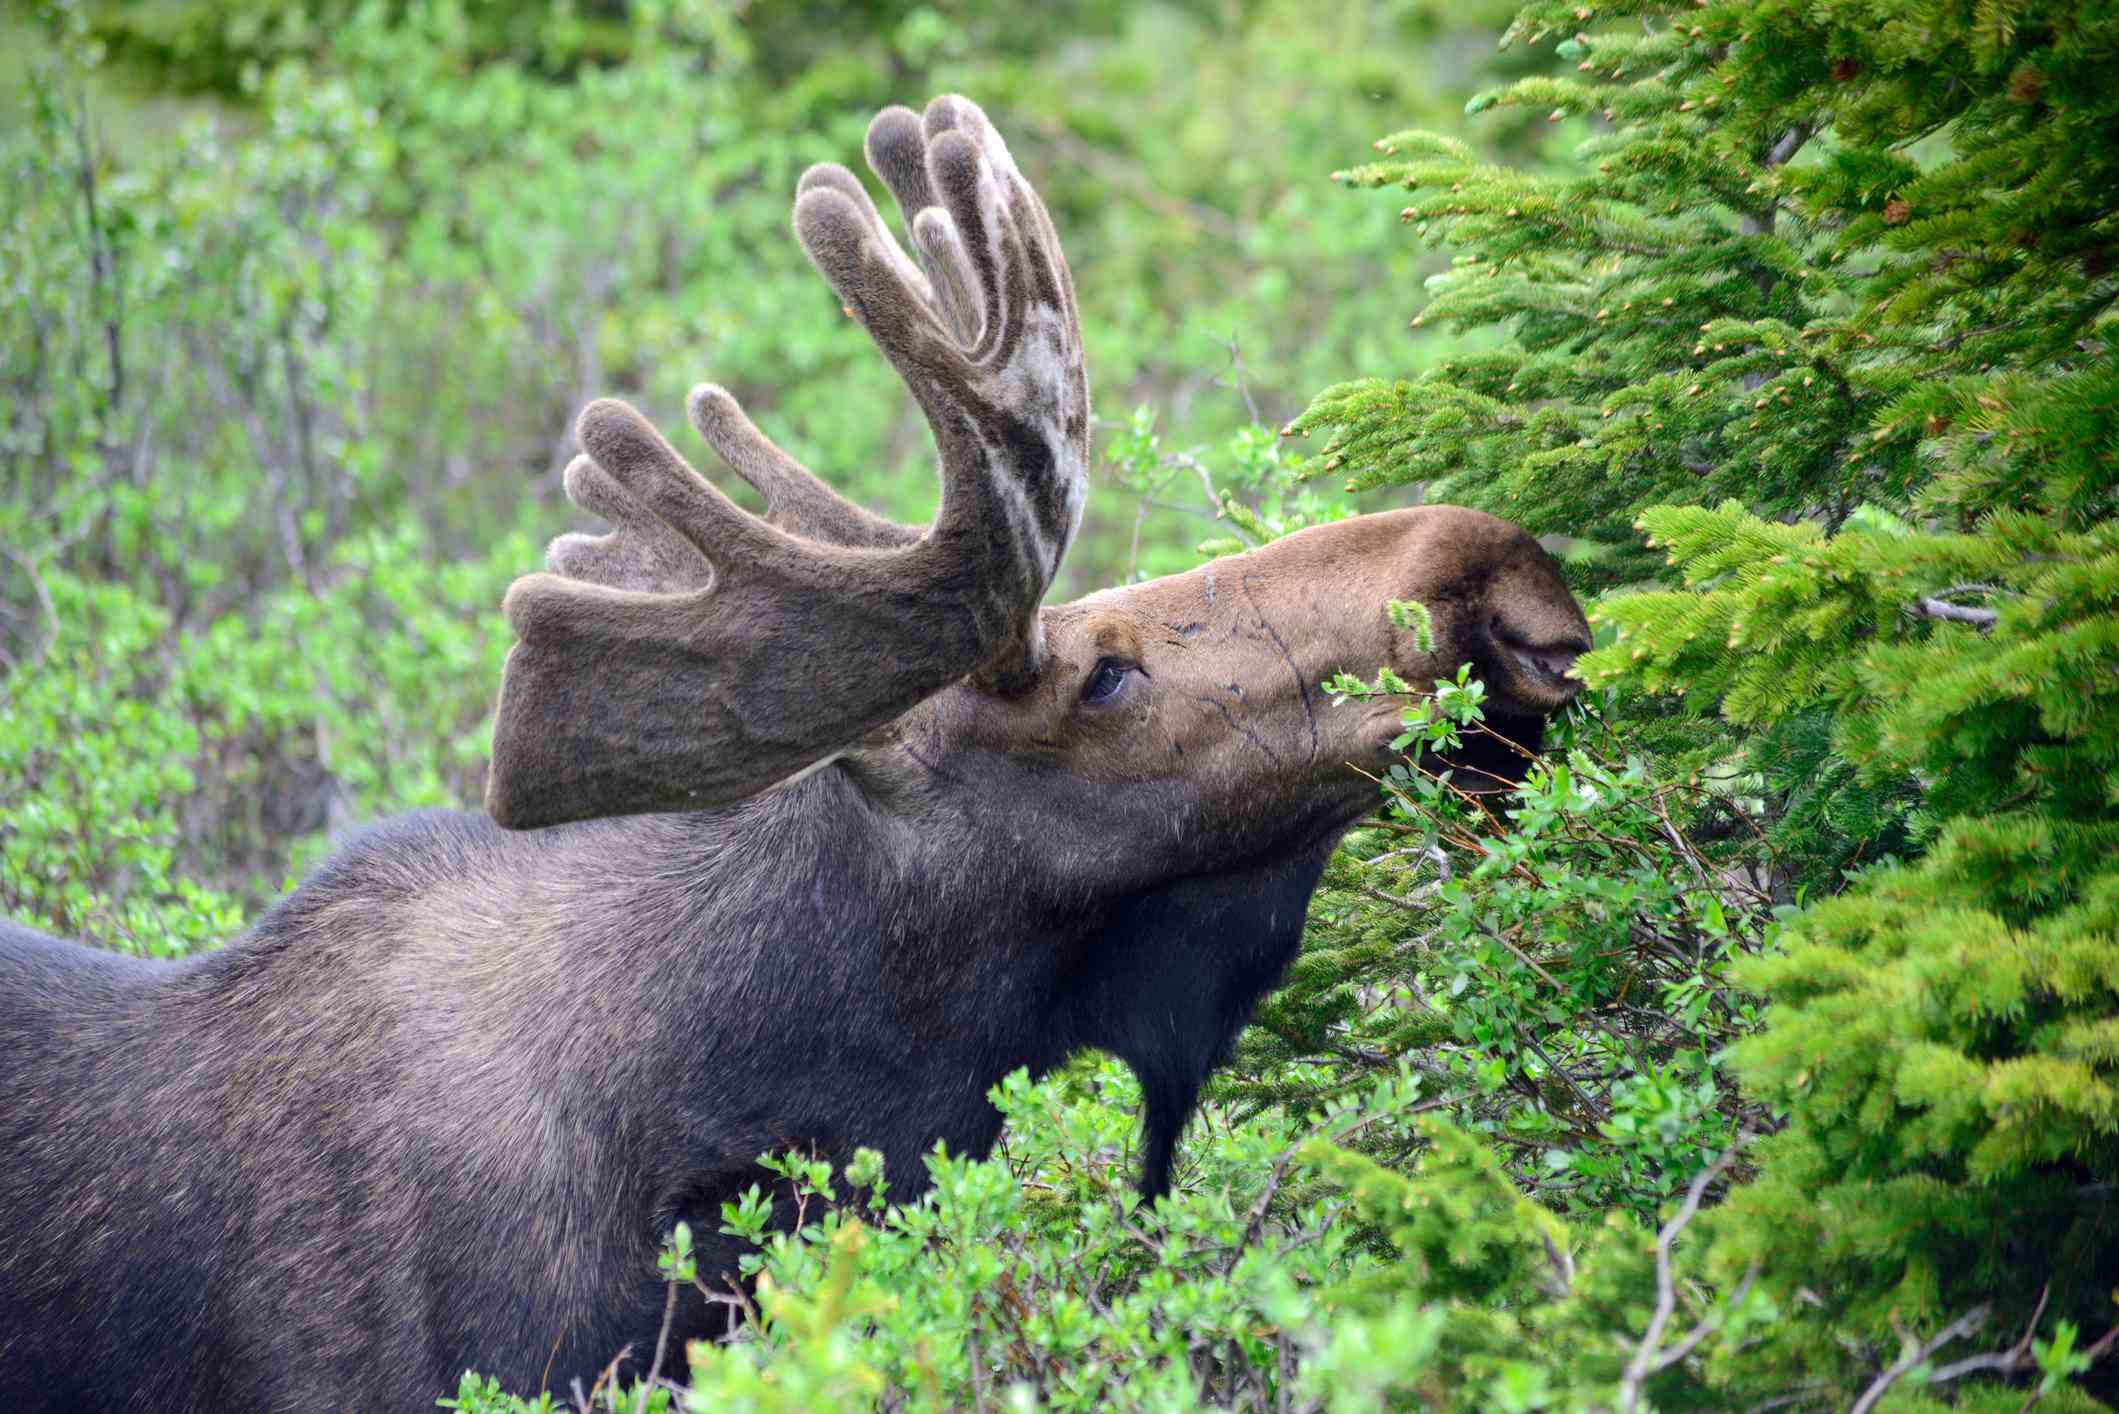 Moose Eating Plants